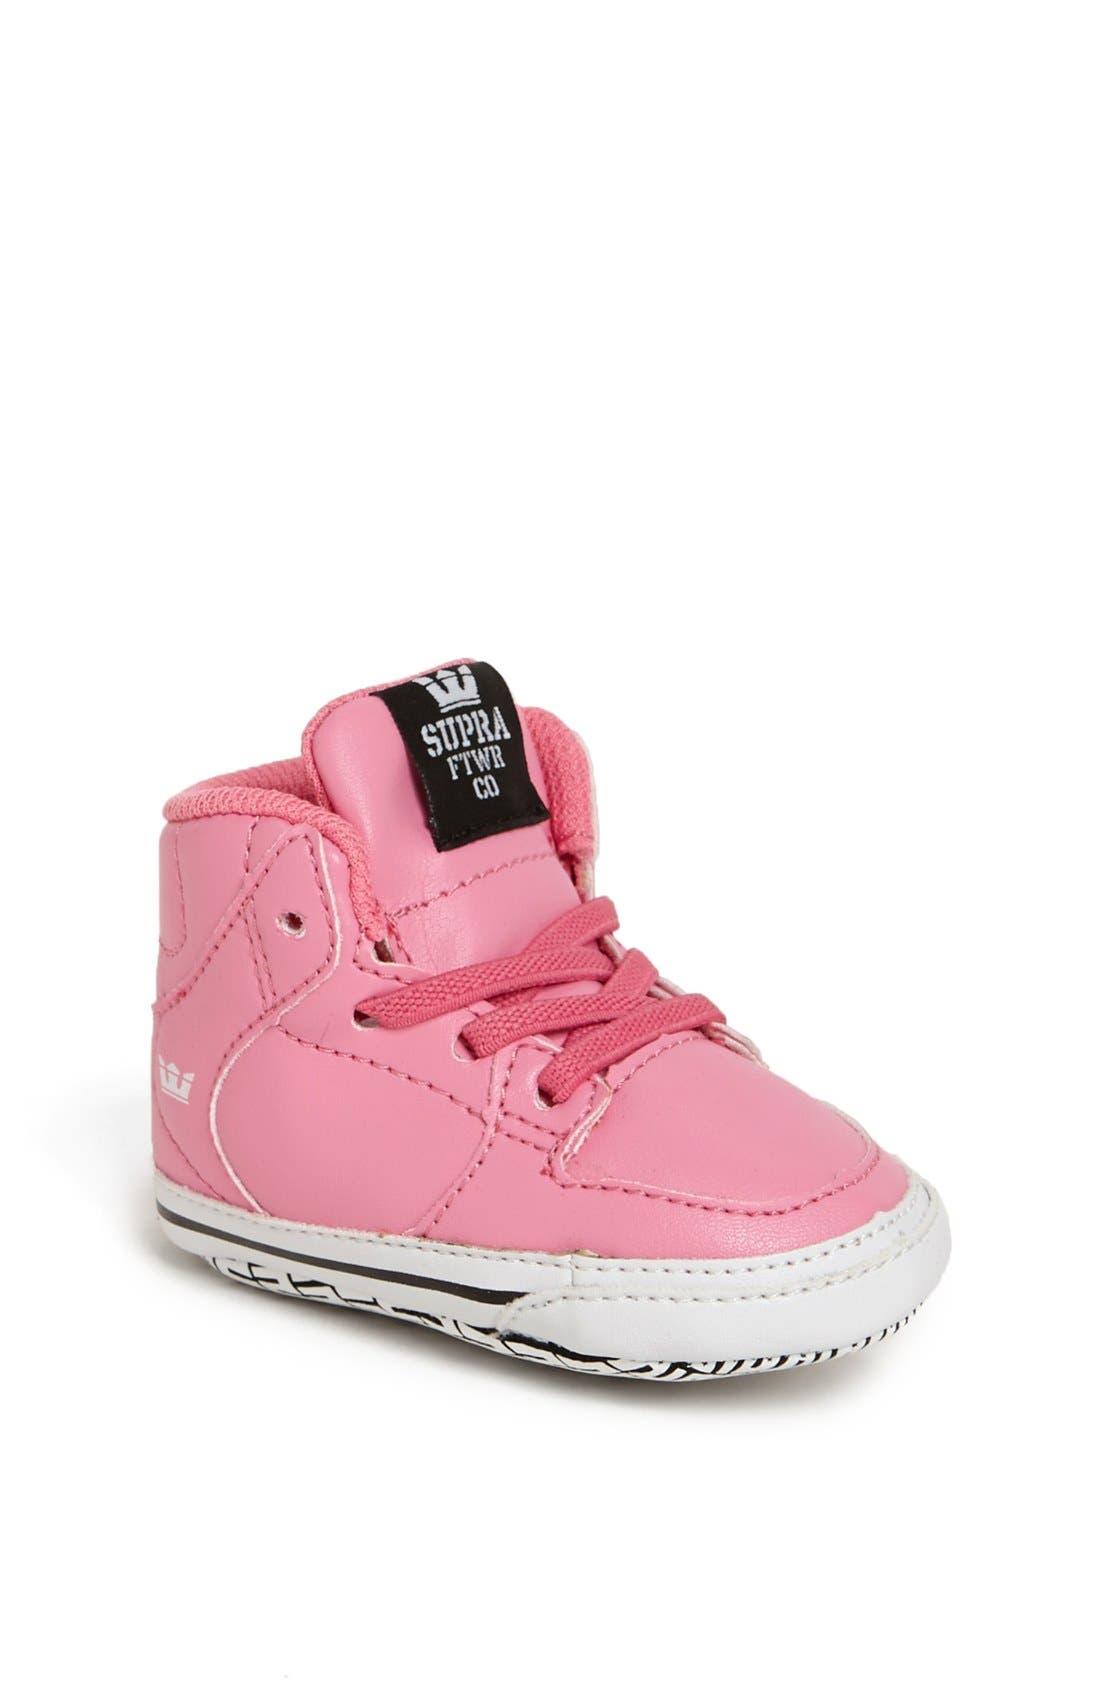 Main Image - Supra 'Vaider' Crib Shoe (Baby)